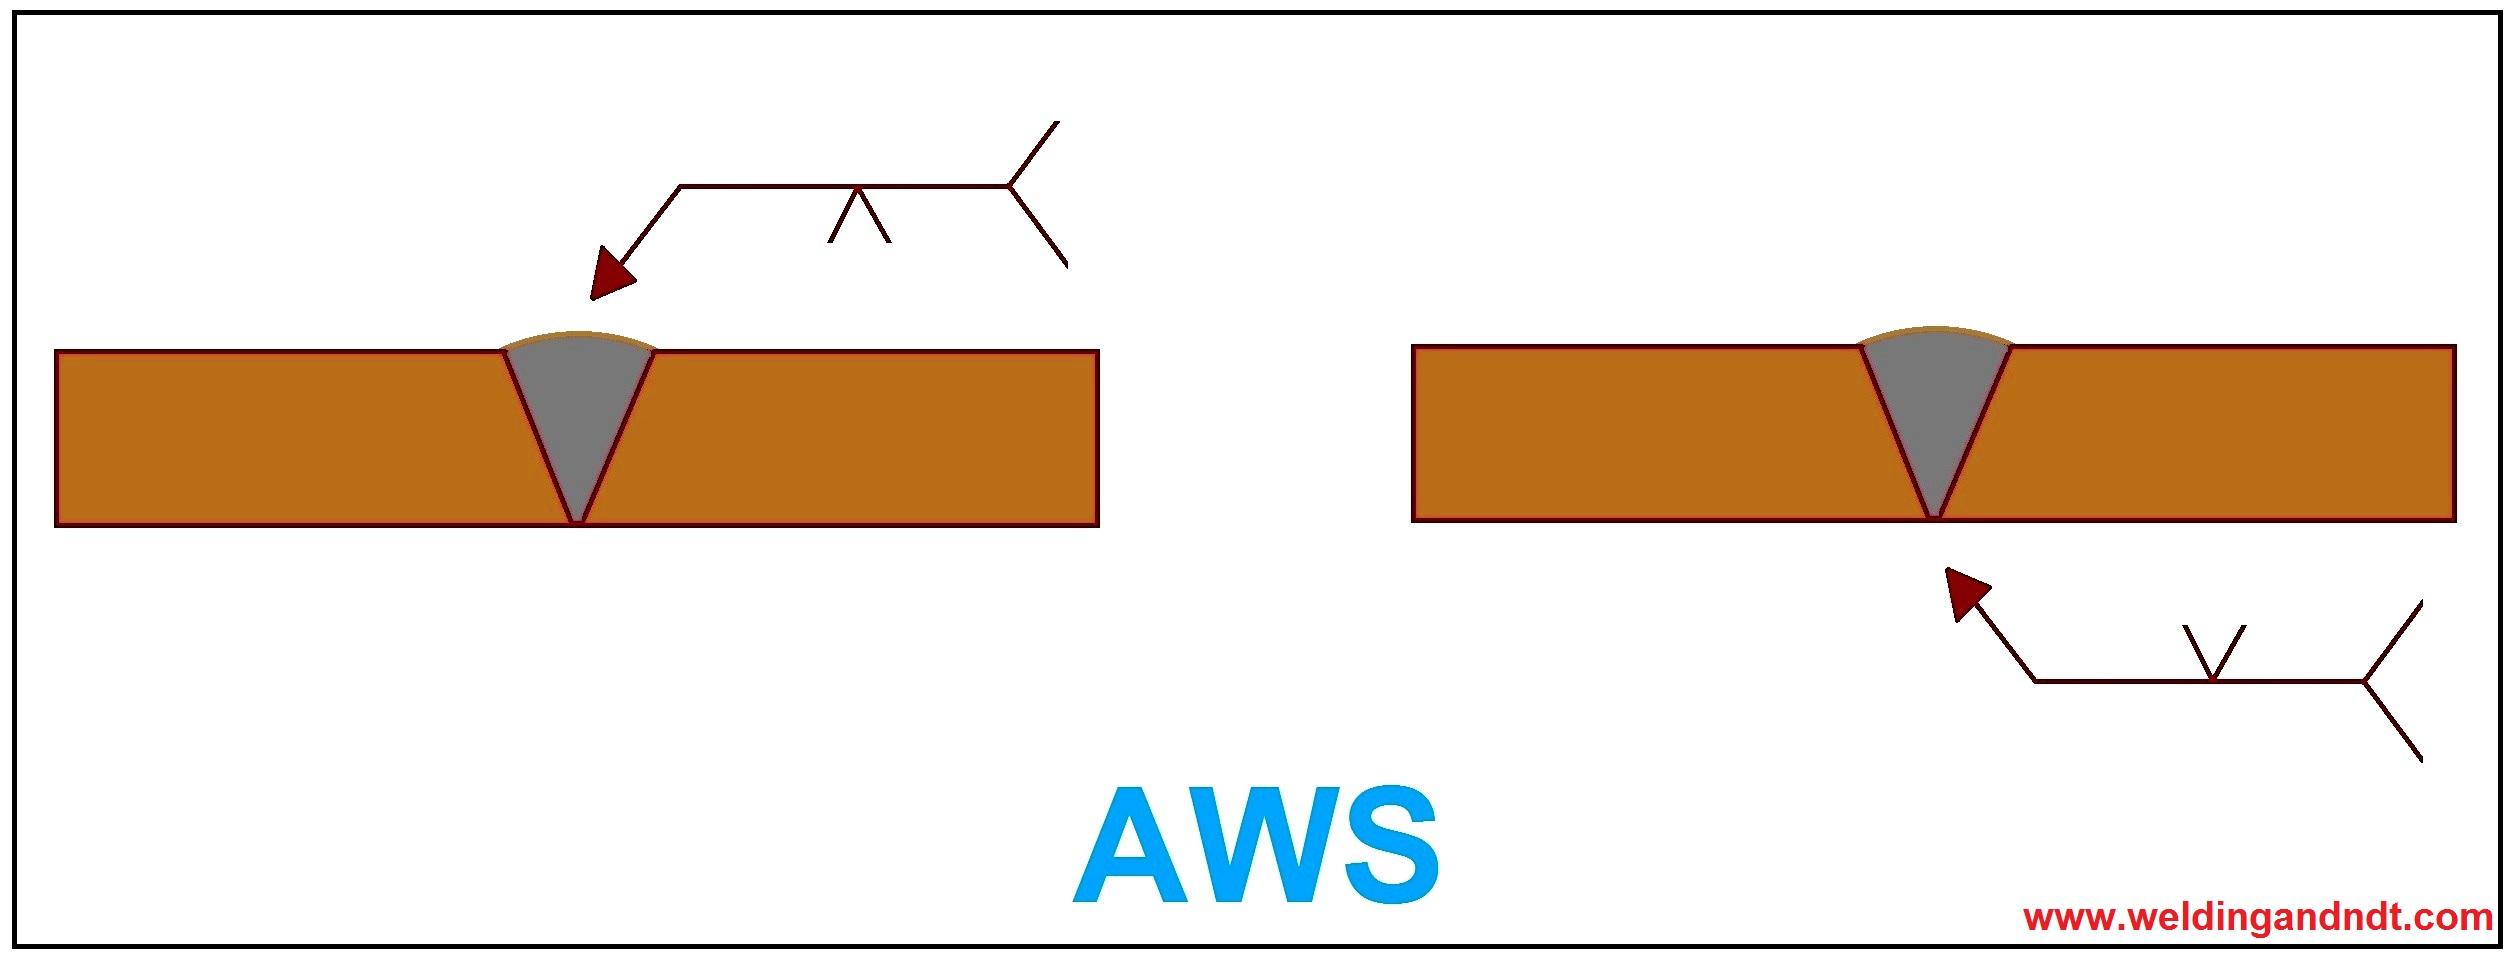 welding symbol for butt joint - AWS